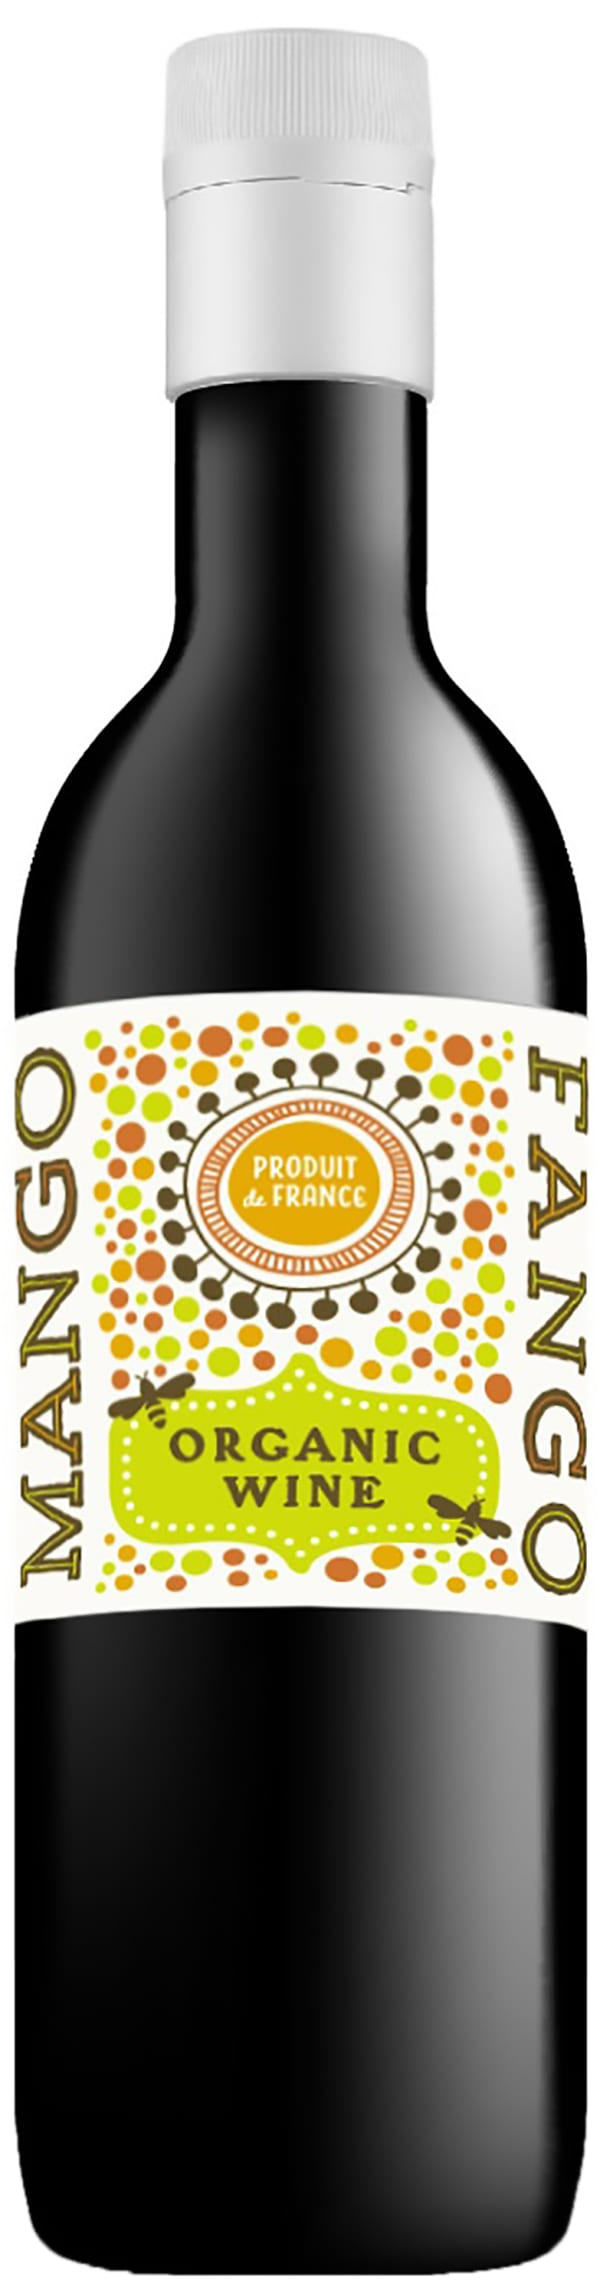 Mango Fango Grenache Syrah Organic 2015 plastflaska